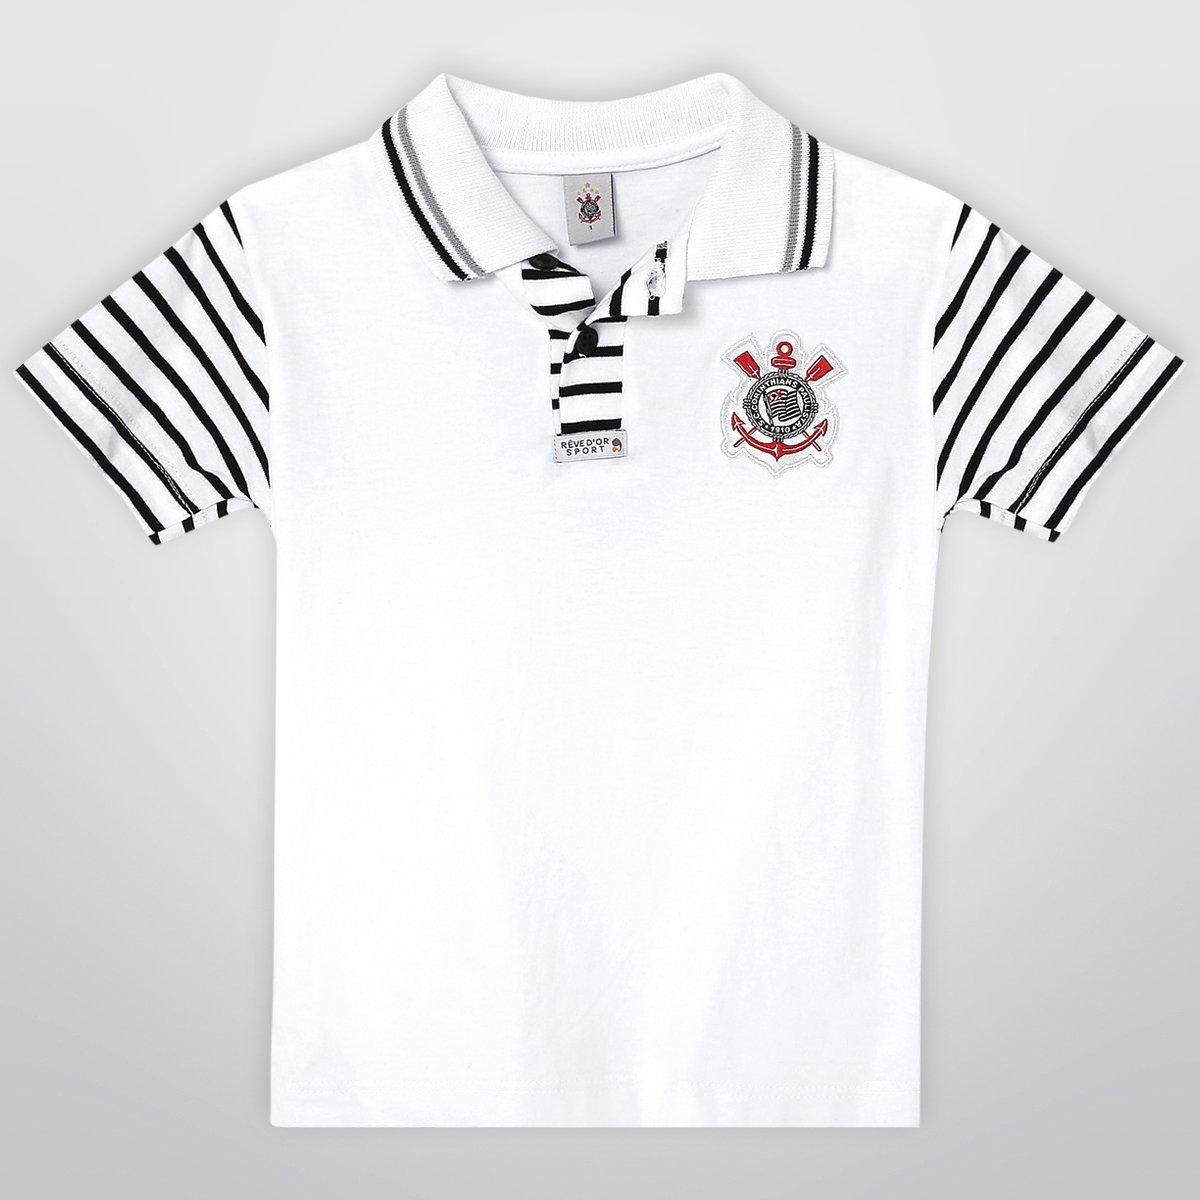 Camisa Polo Corinthians Infantil - Compre Agora  ac15a63d5fbb5